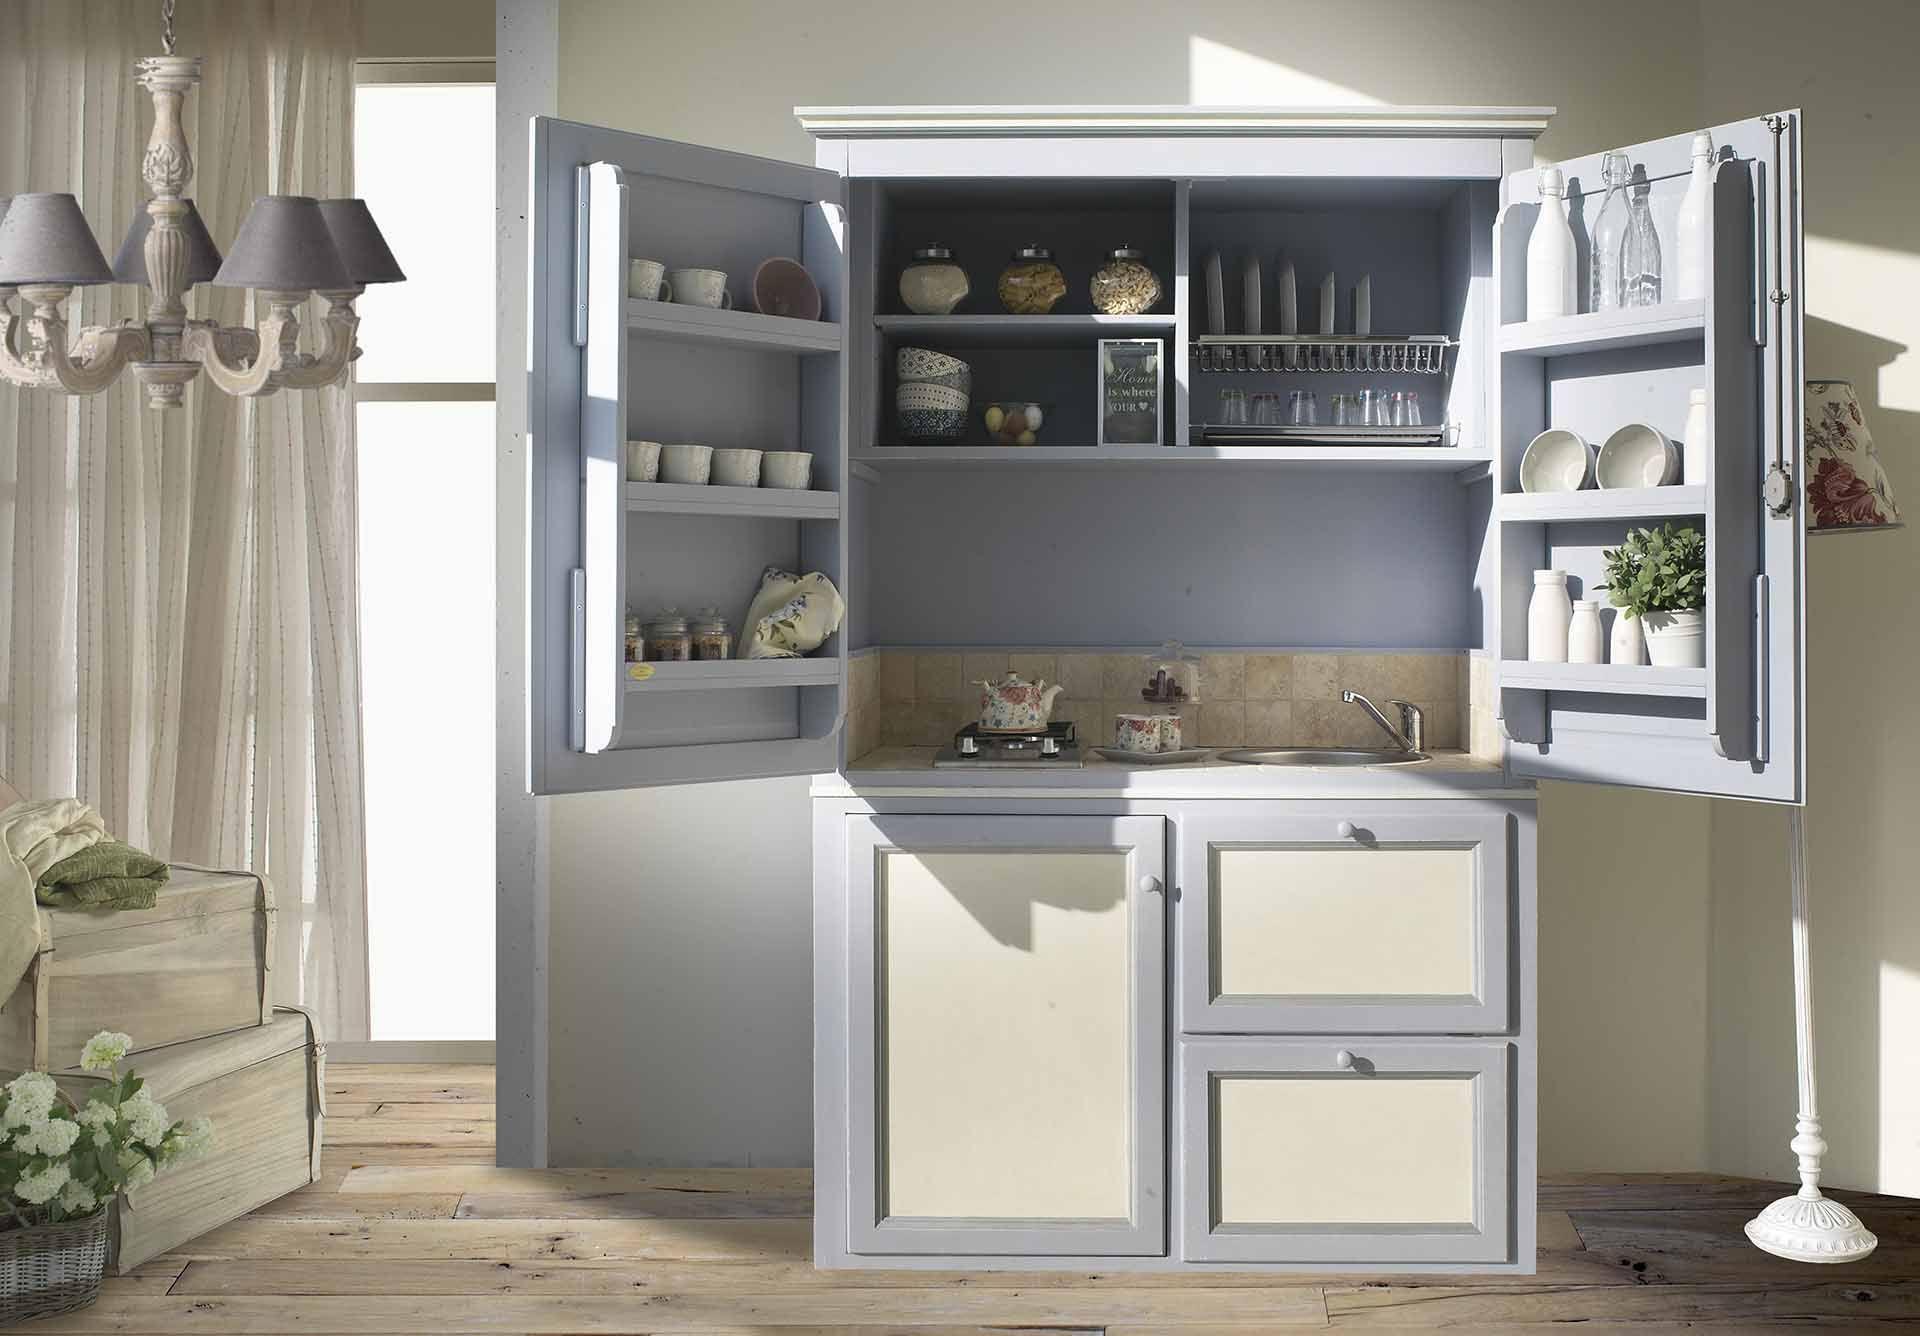 La Bottega del Falegname | Mini Cucine,Cucina a Scomparsa ...